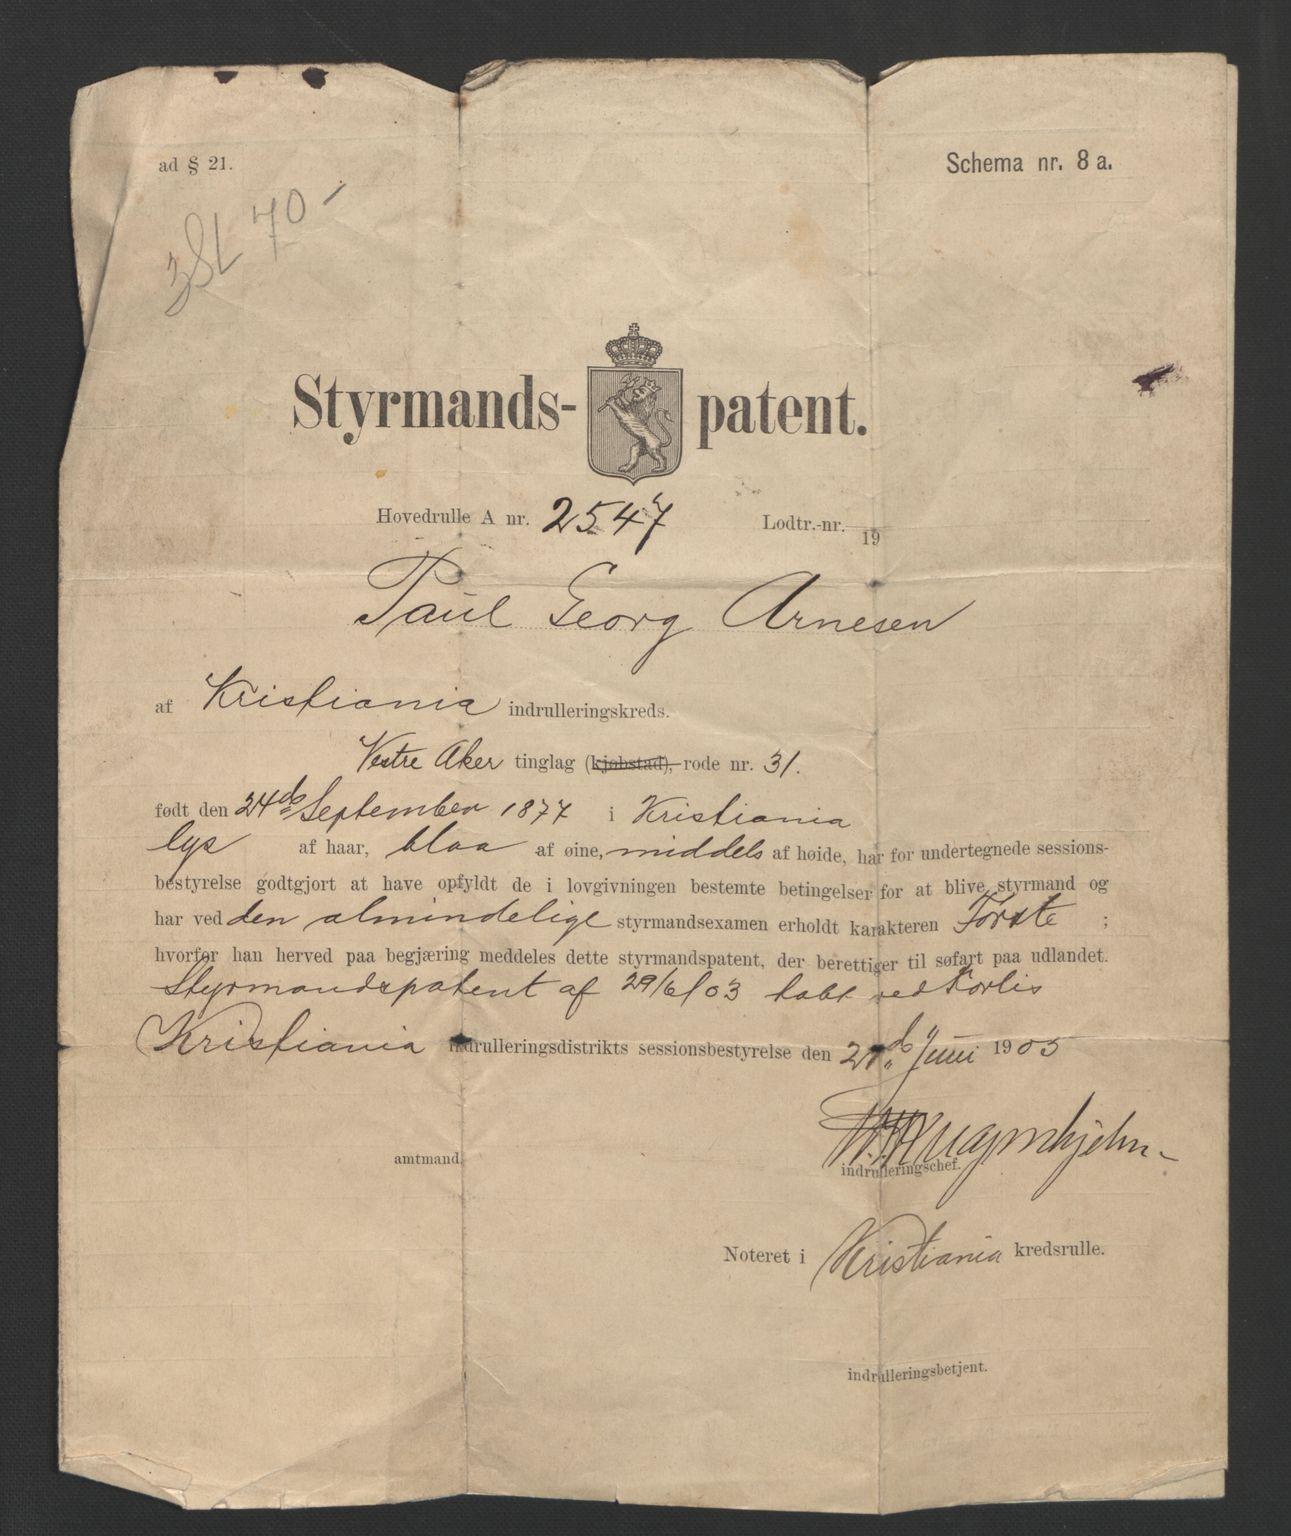 SAO, Oslo sjømannskontor, F/Fc/L0002: Hovedrulle, 1889-1893, s. upaginert